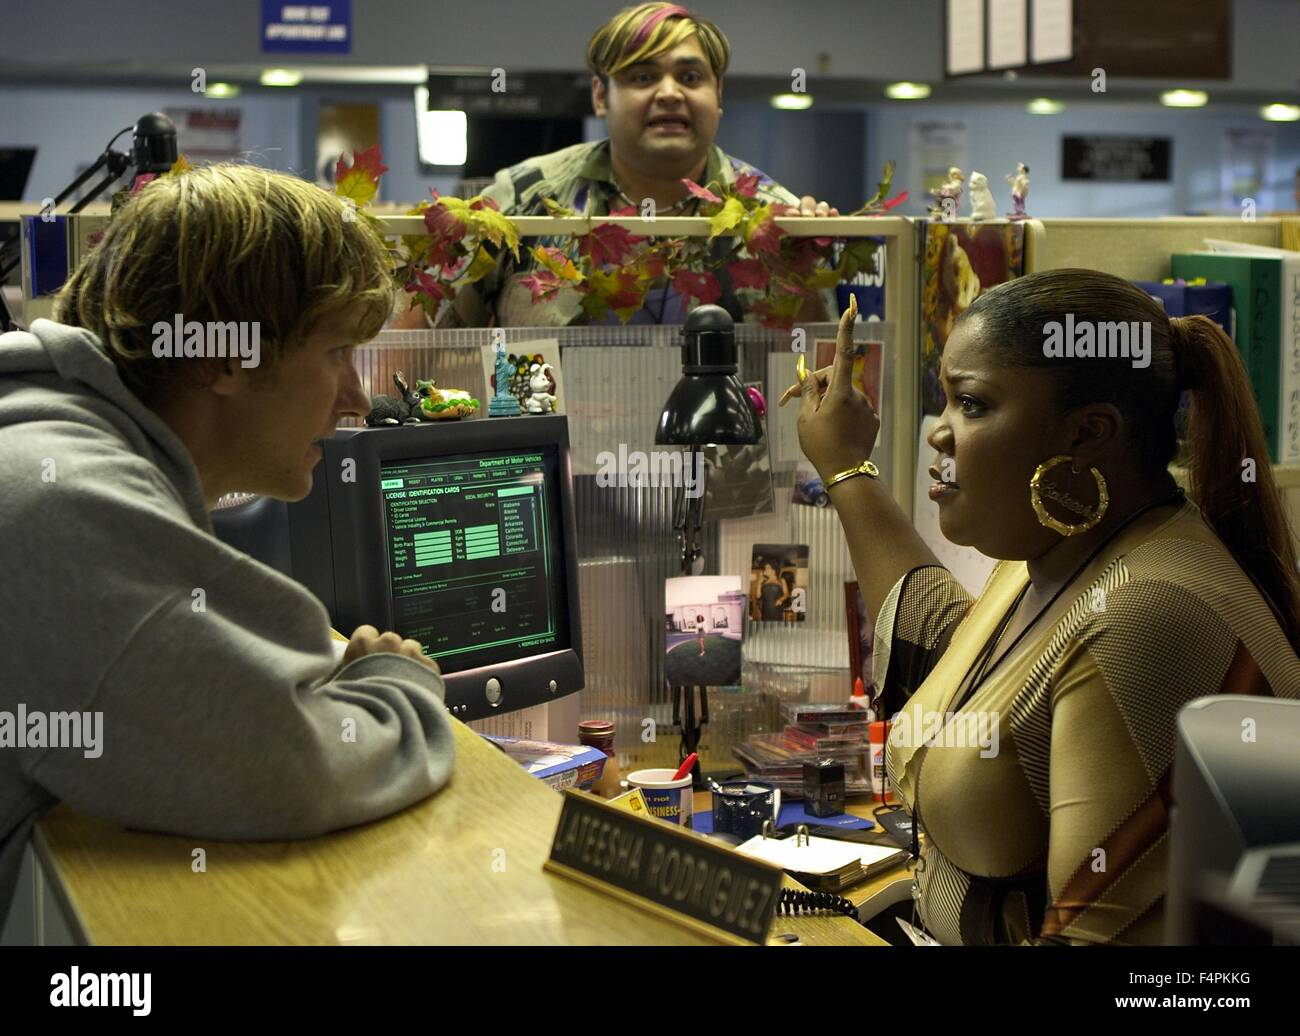 Domino / 2005 directed by Tony Scott [New Line Cinema] - Stock Image